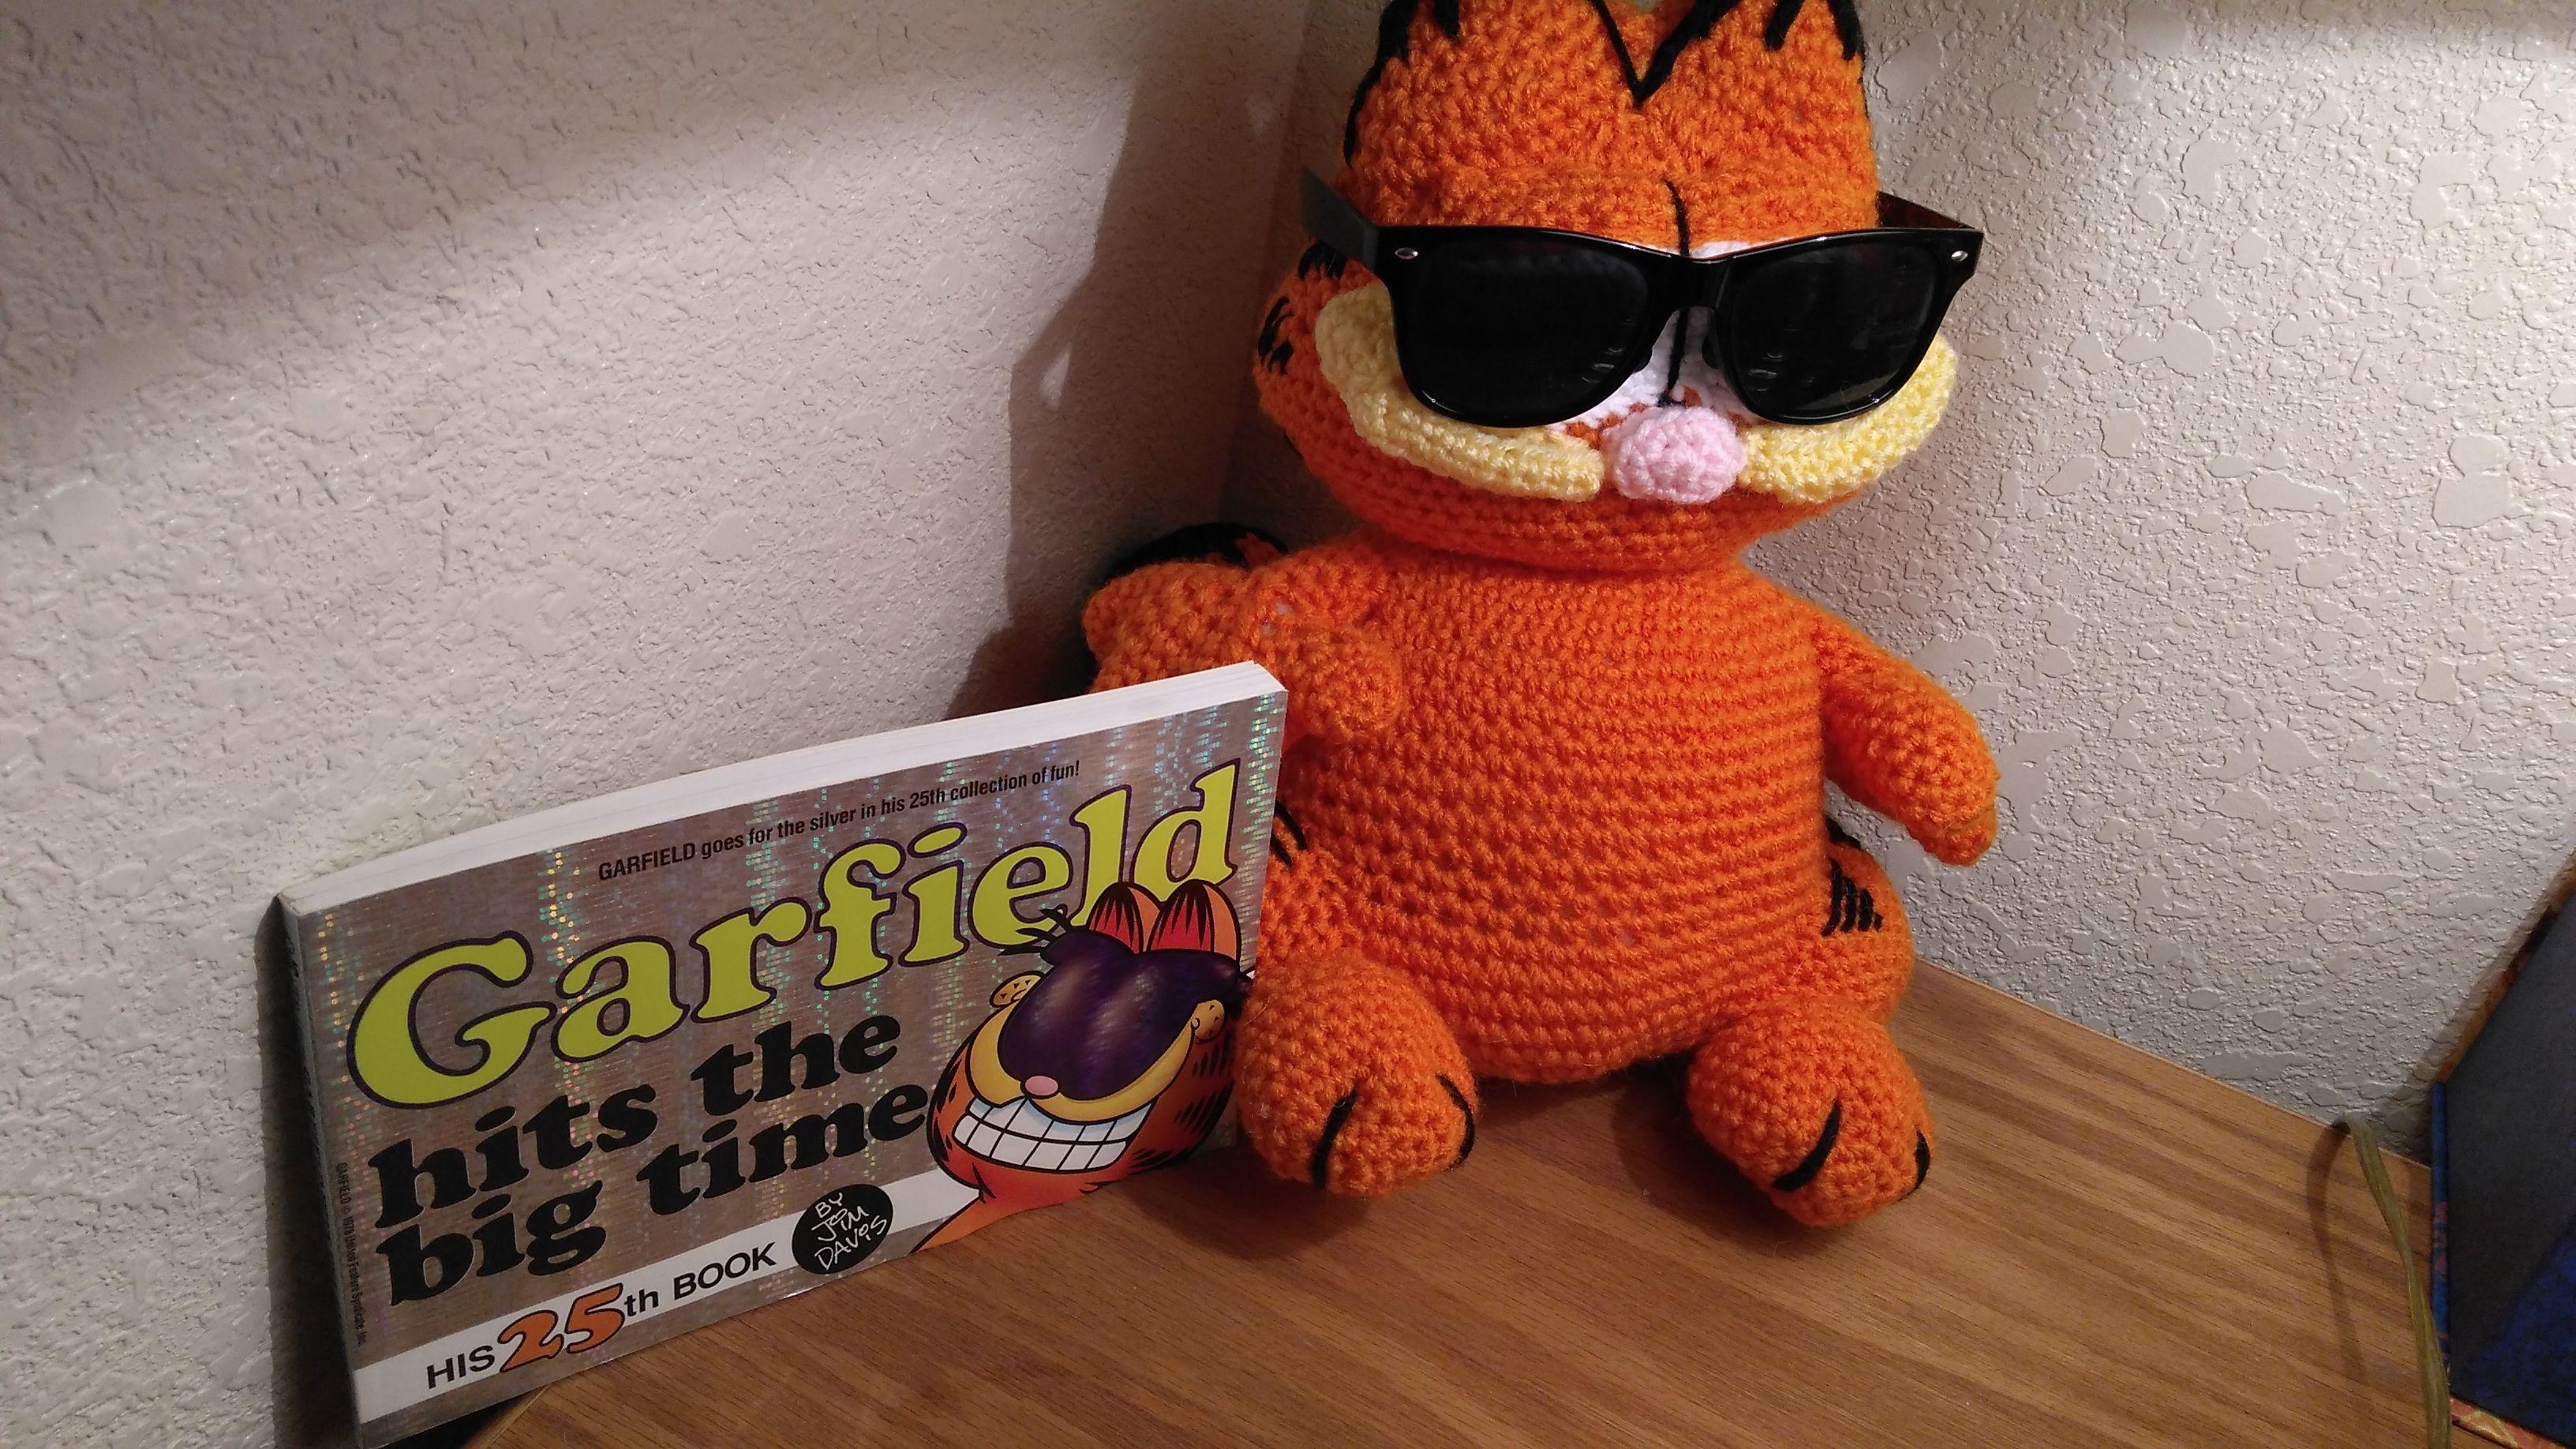 Amigurumi Crochet Garfield Patterns - Amigurumi Patterns Tutorials | 1836x3264